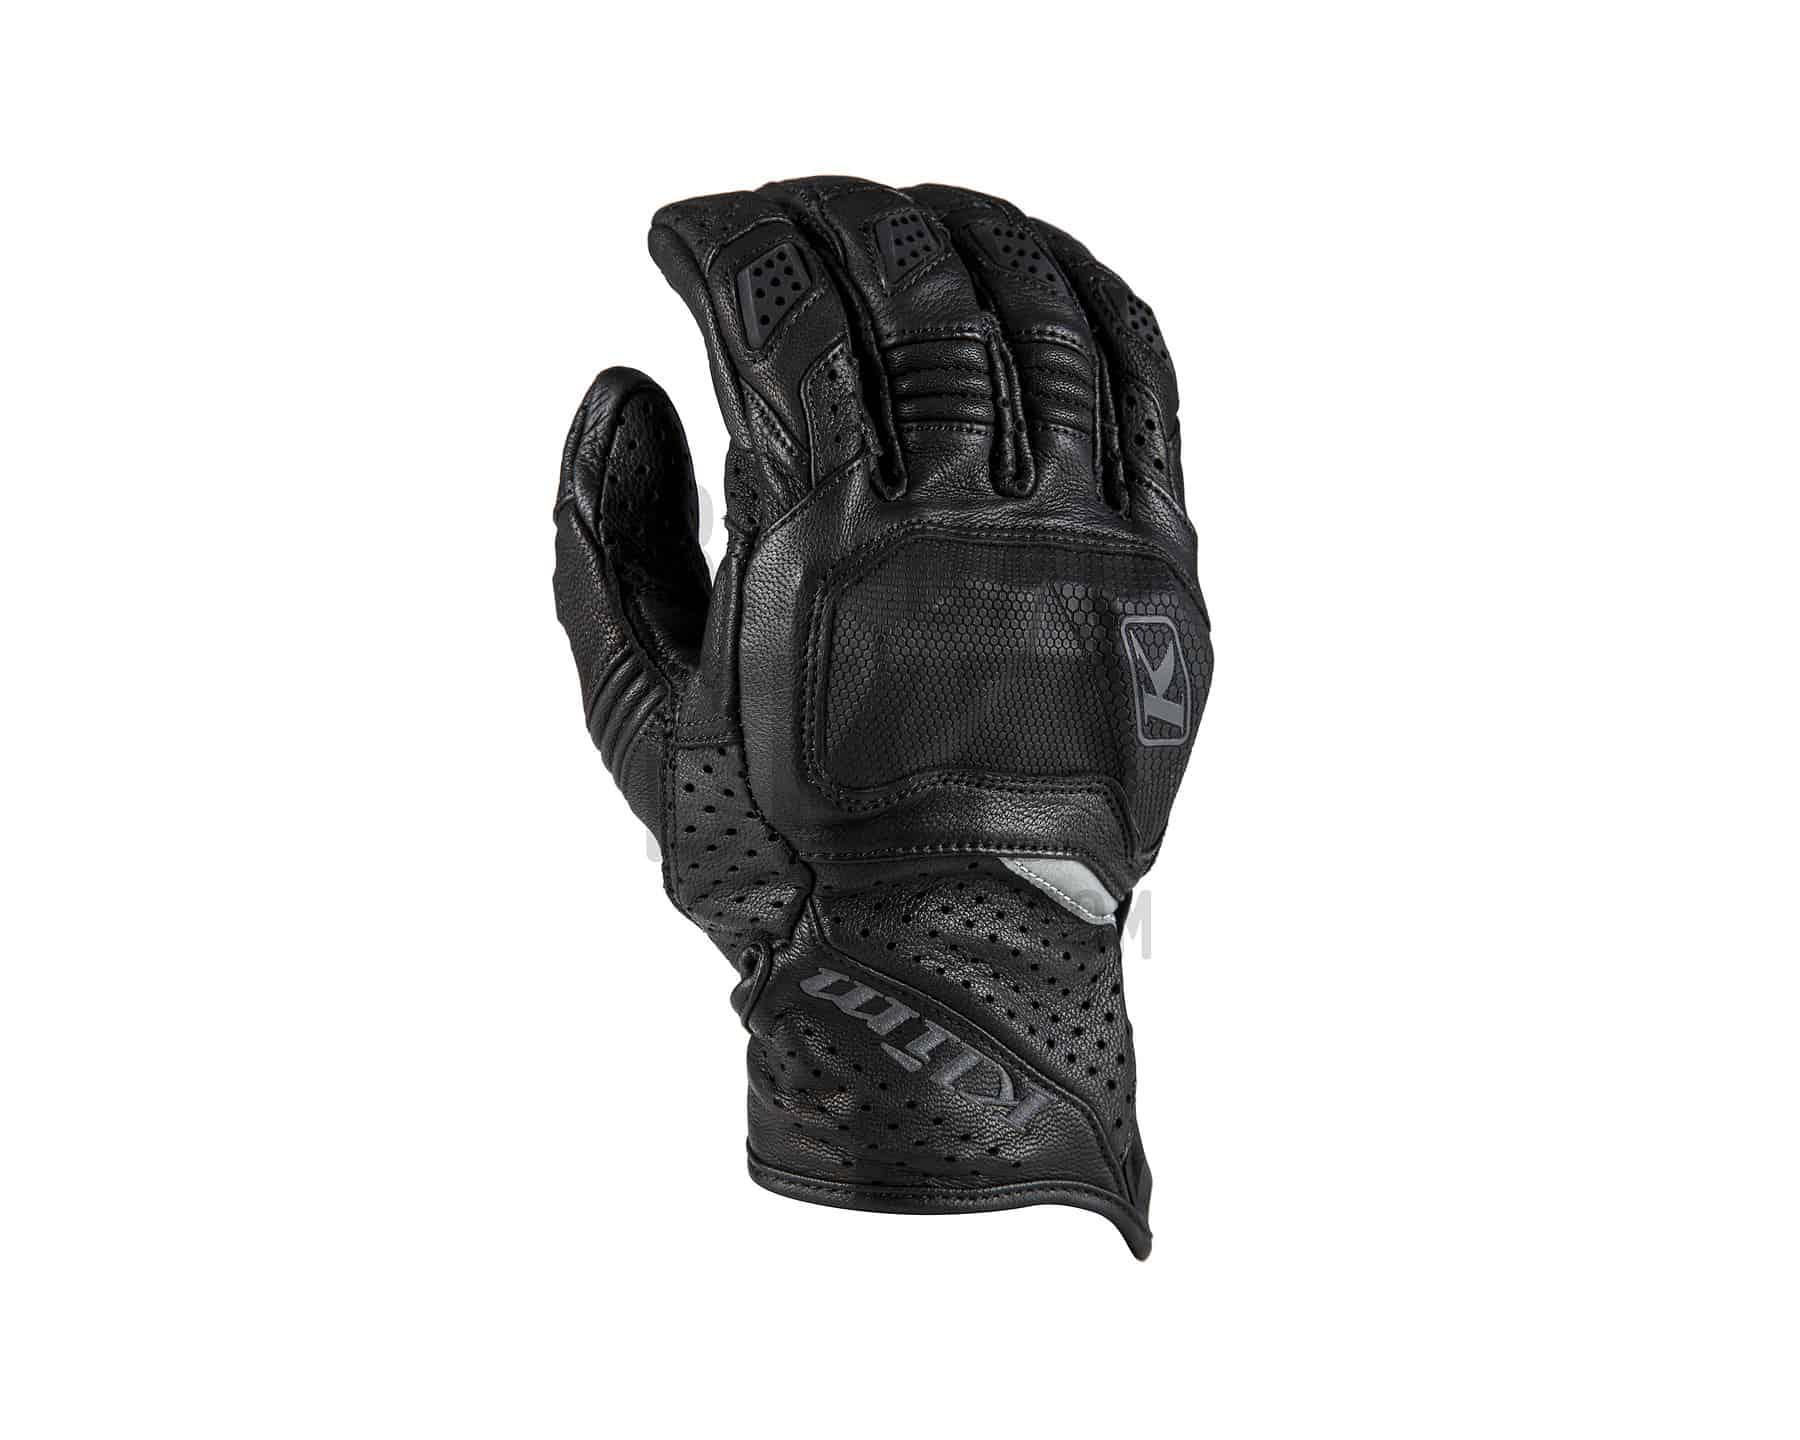 Badlands Aero Pro Short Glove_3924-000_Black_01